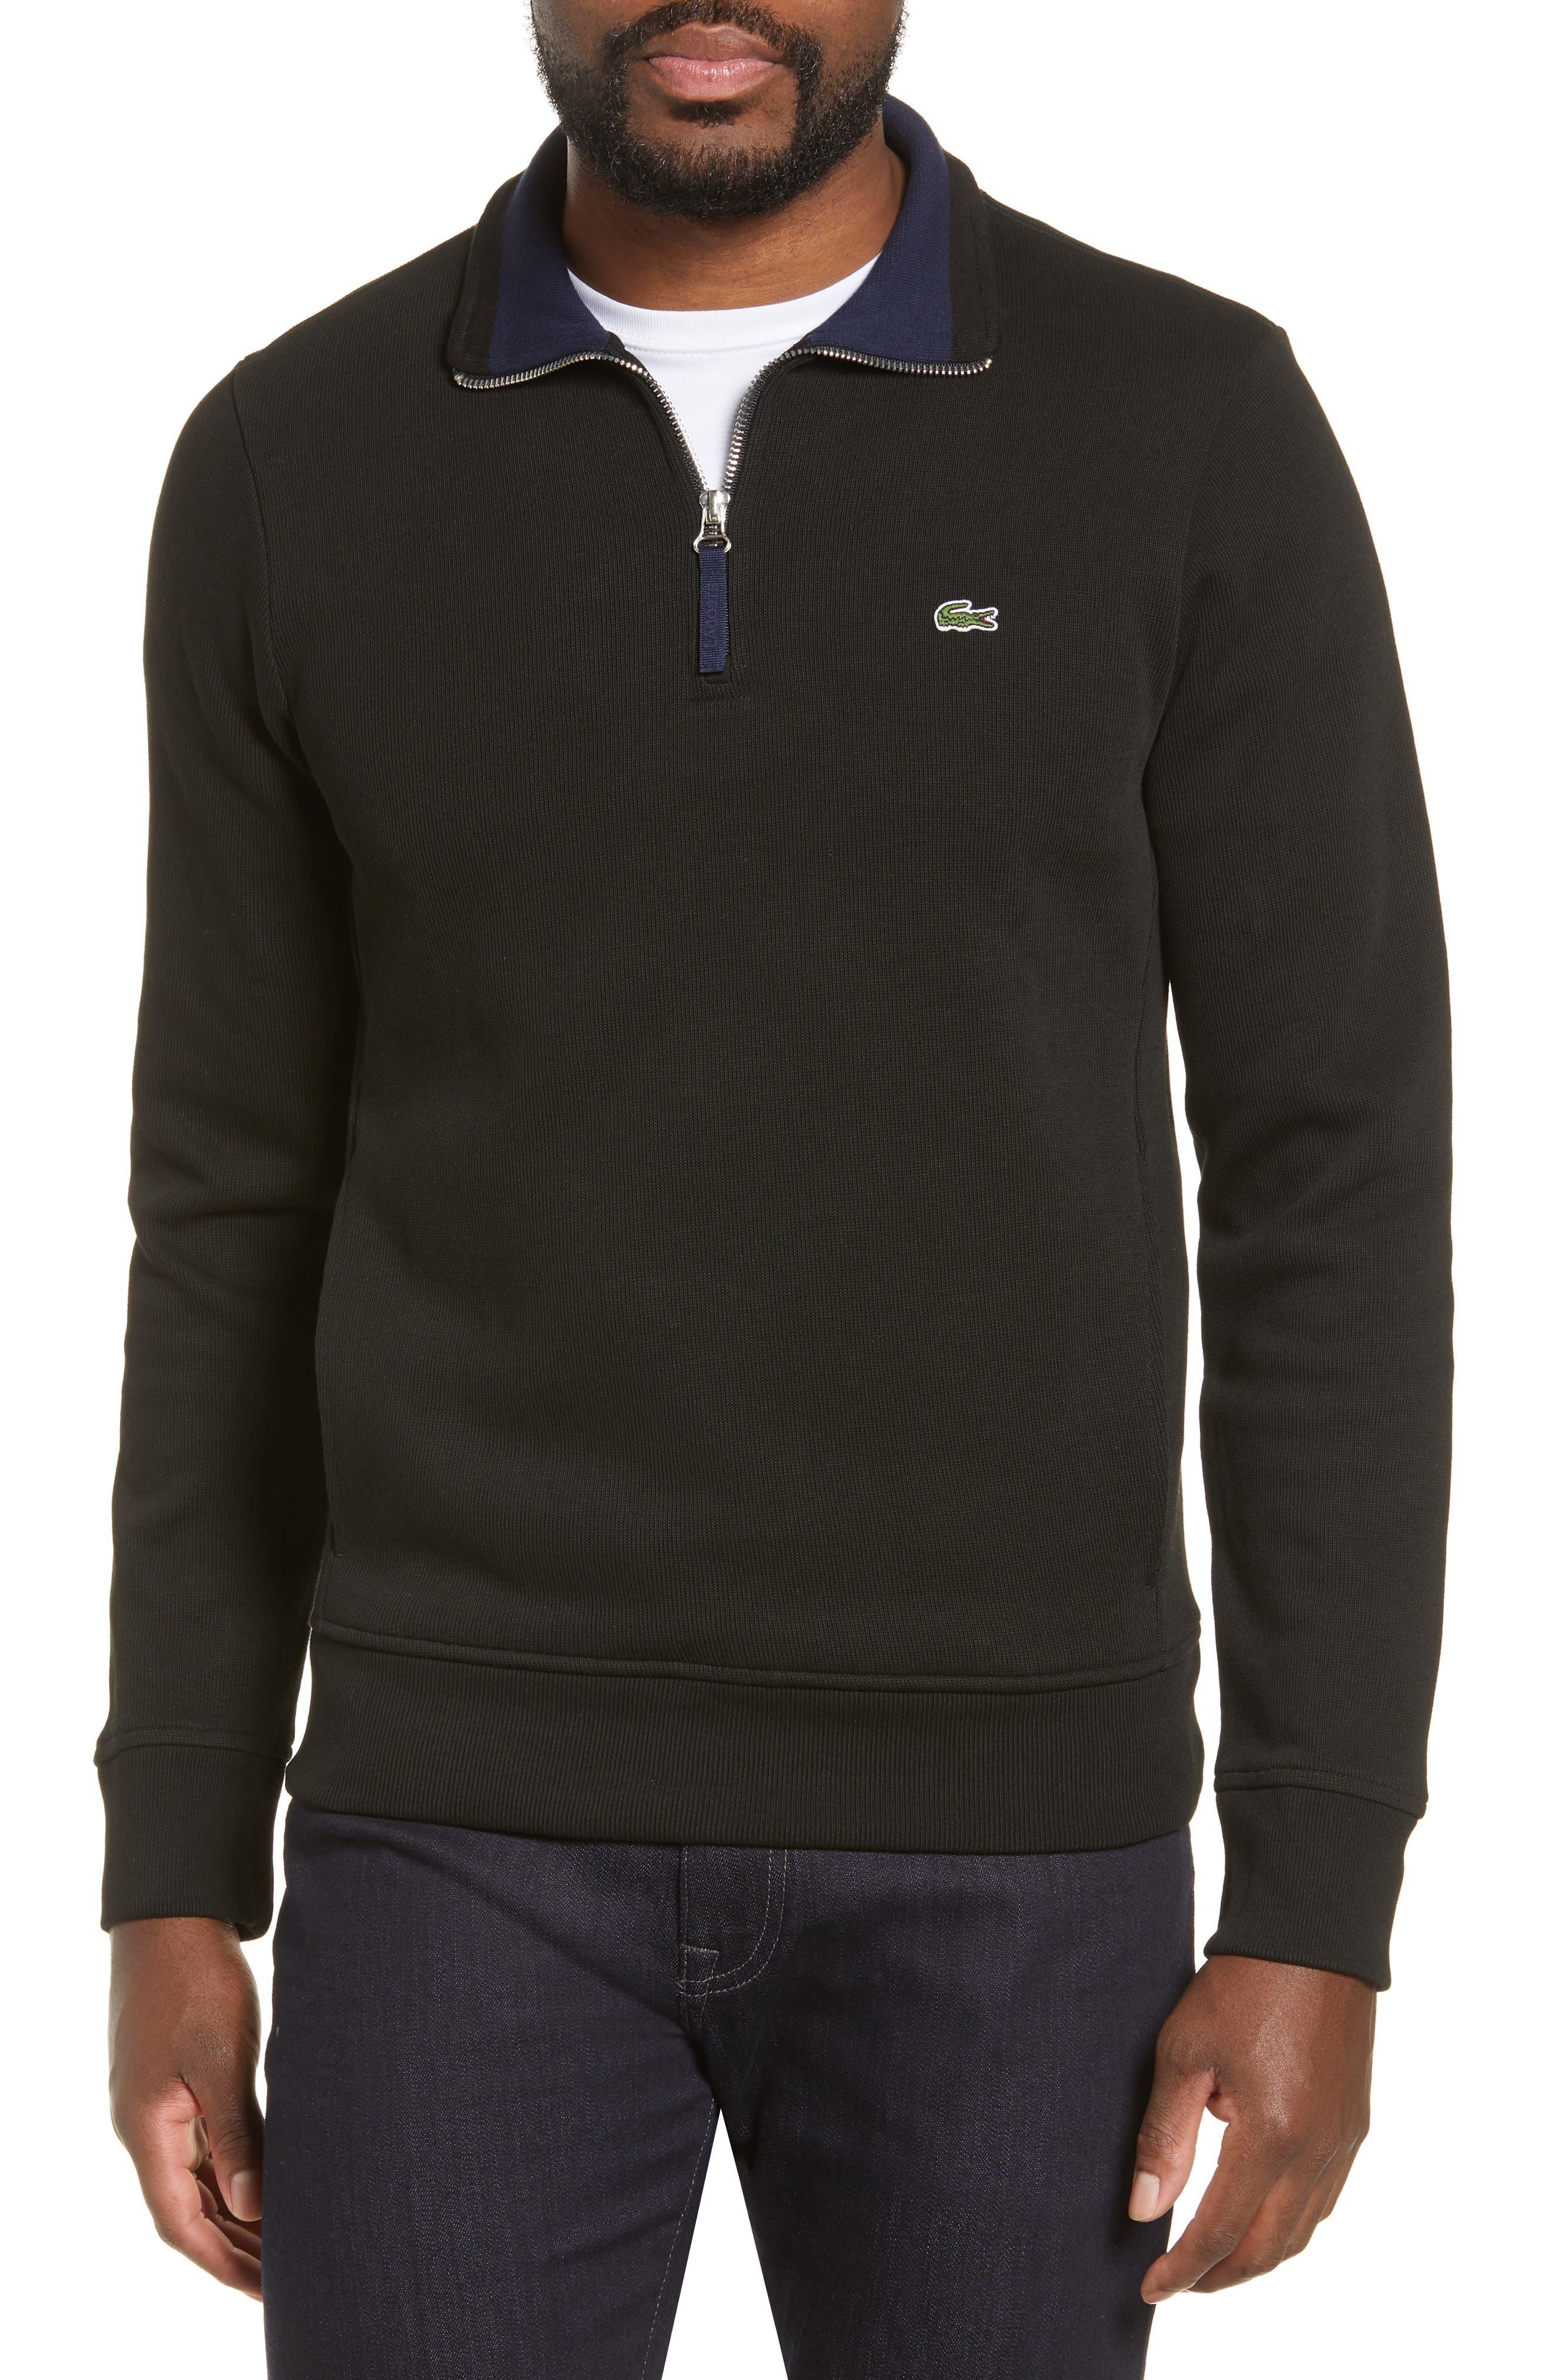 LACOSTE,                             Quarter Zip Pullover,                             Main thumbnail 1, color,                             BLACK/ NAVY BLUE